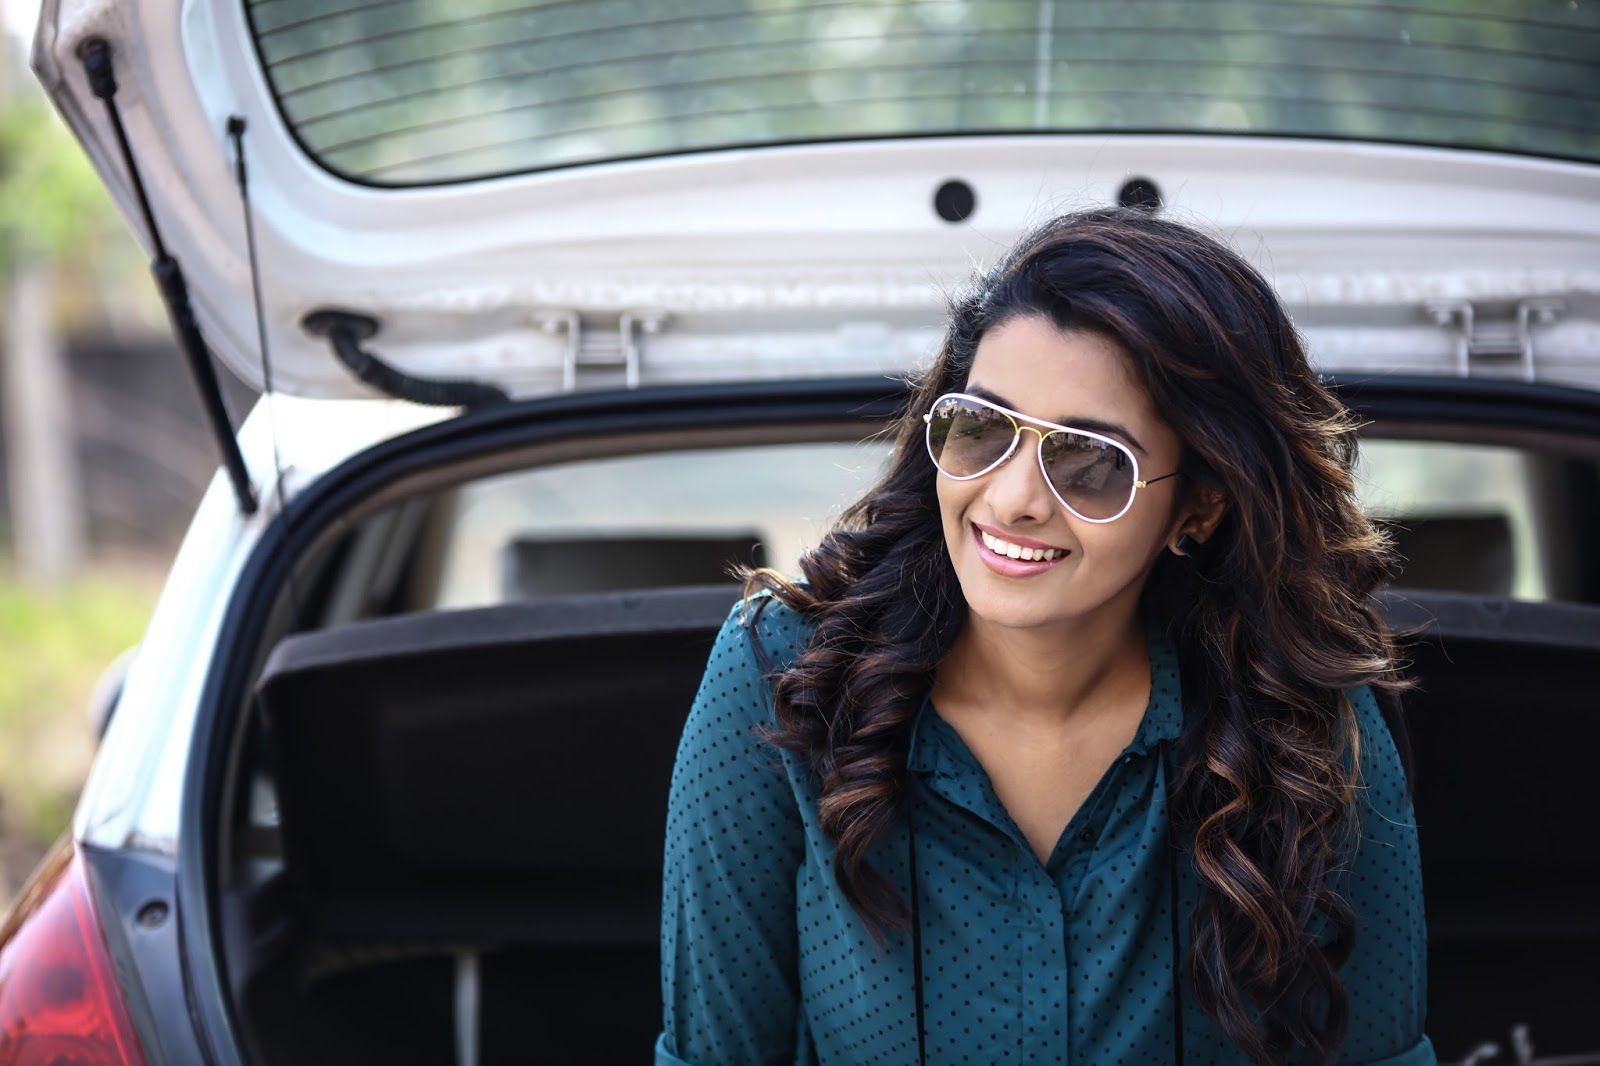 Singam 3 Hd Wallpaper Priya Bhavani Shankar South Indian Actress